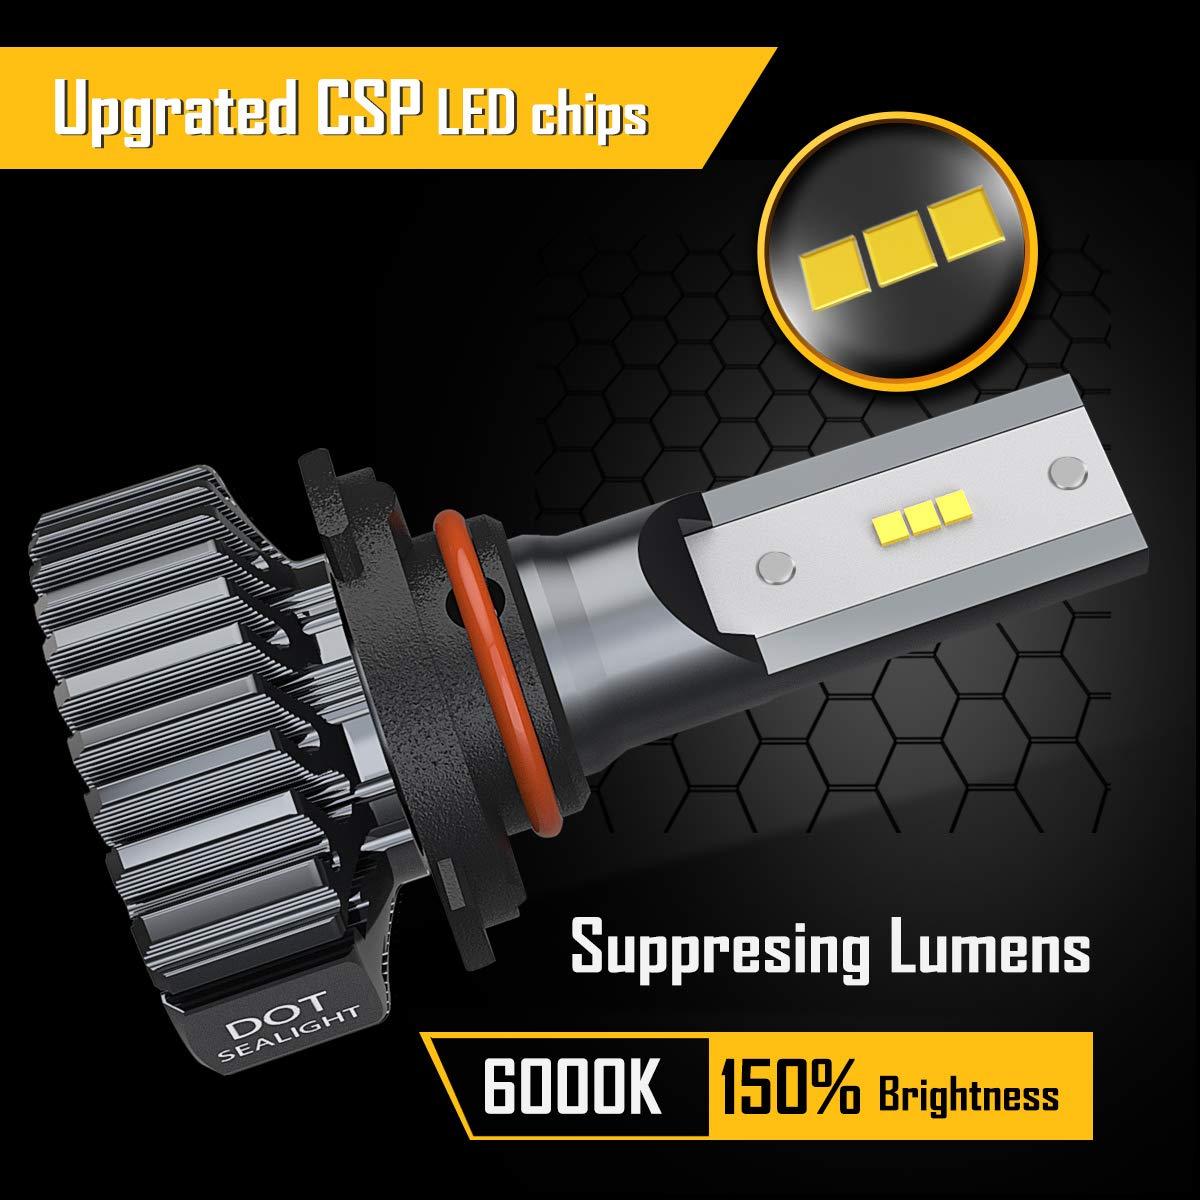 SEALIGHT S1 series Super Bright 24xCSP chips LED Automotive Headlamp-6000K Xenon White DOT Approved 2 Pack H4//9003//HB2 LED Headlight Bulbs Hi//Lo Beam Conversion Kit